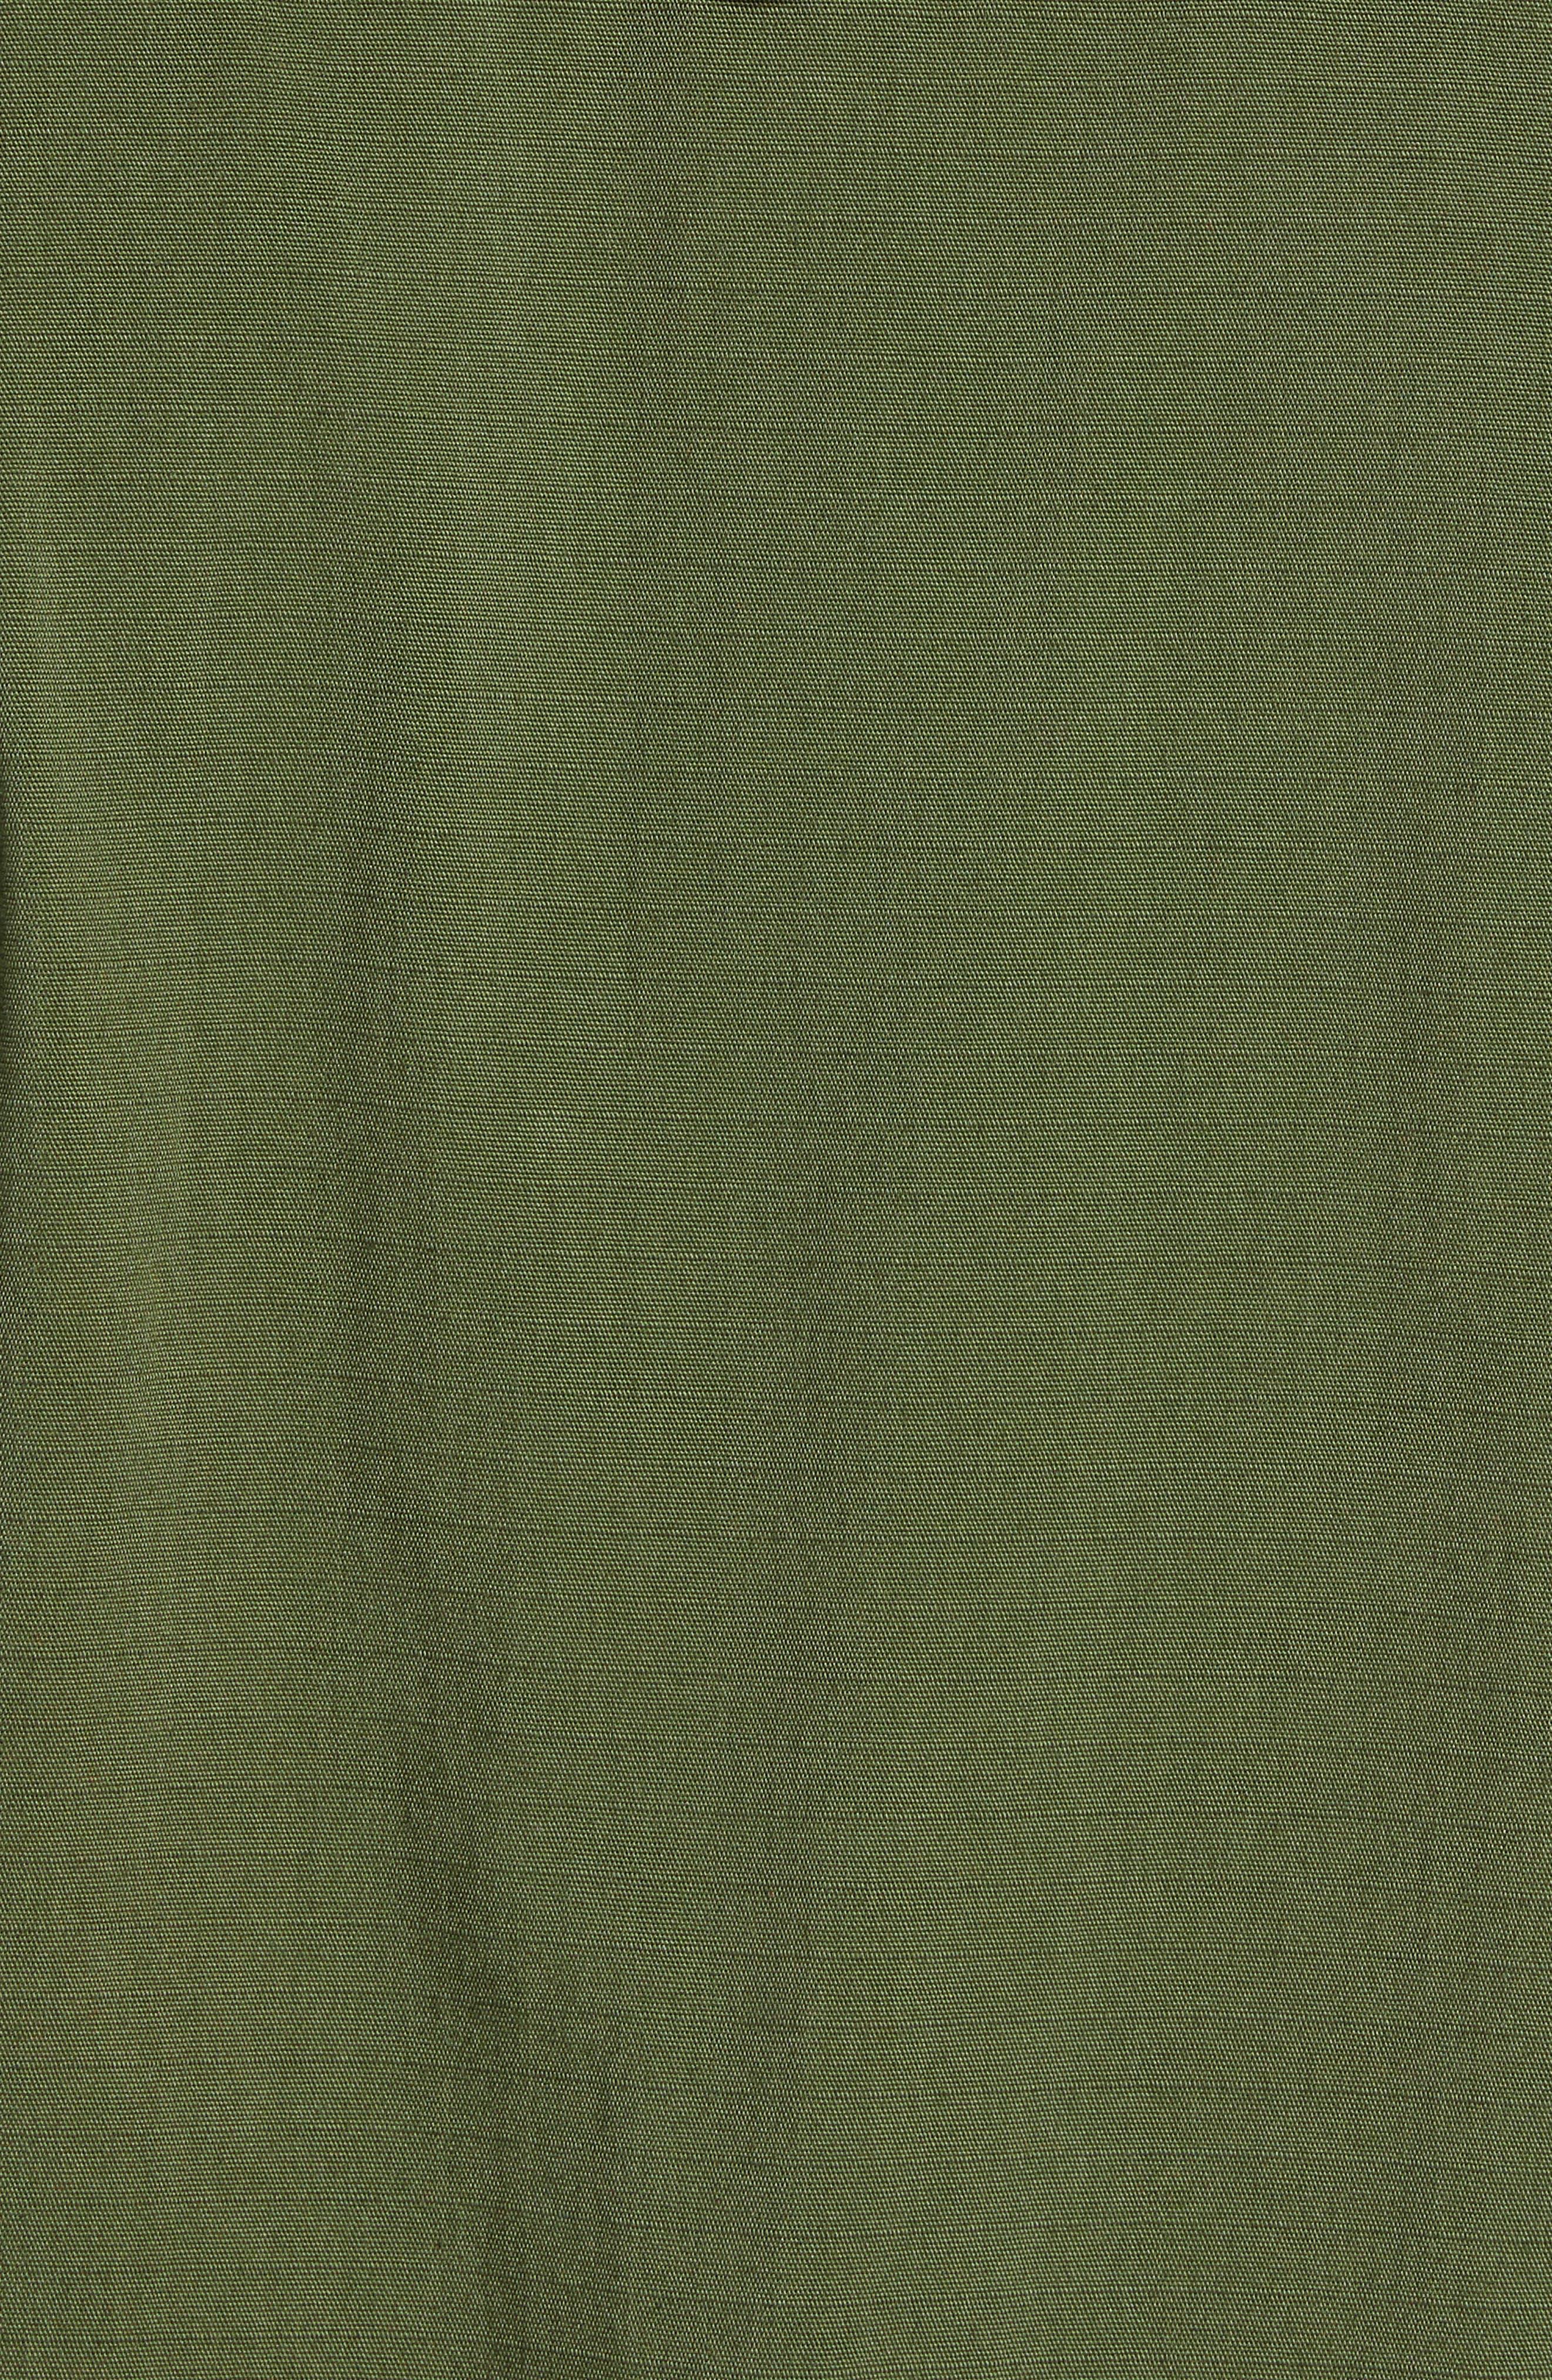 Field Jacket,                             Alternate thumbnail 7, color,                             OLIVE